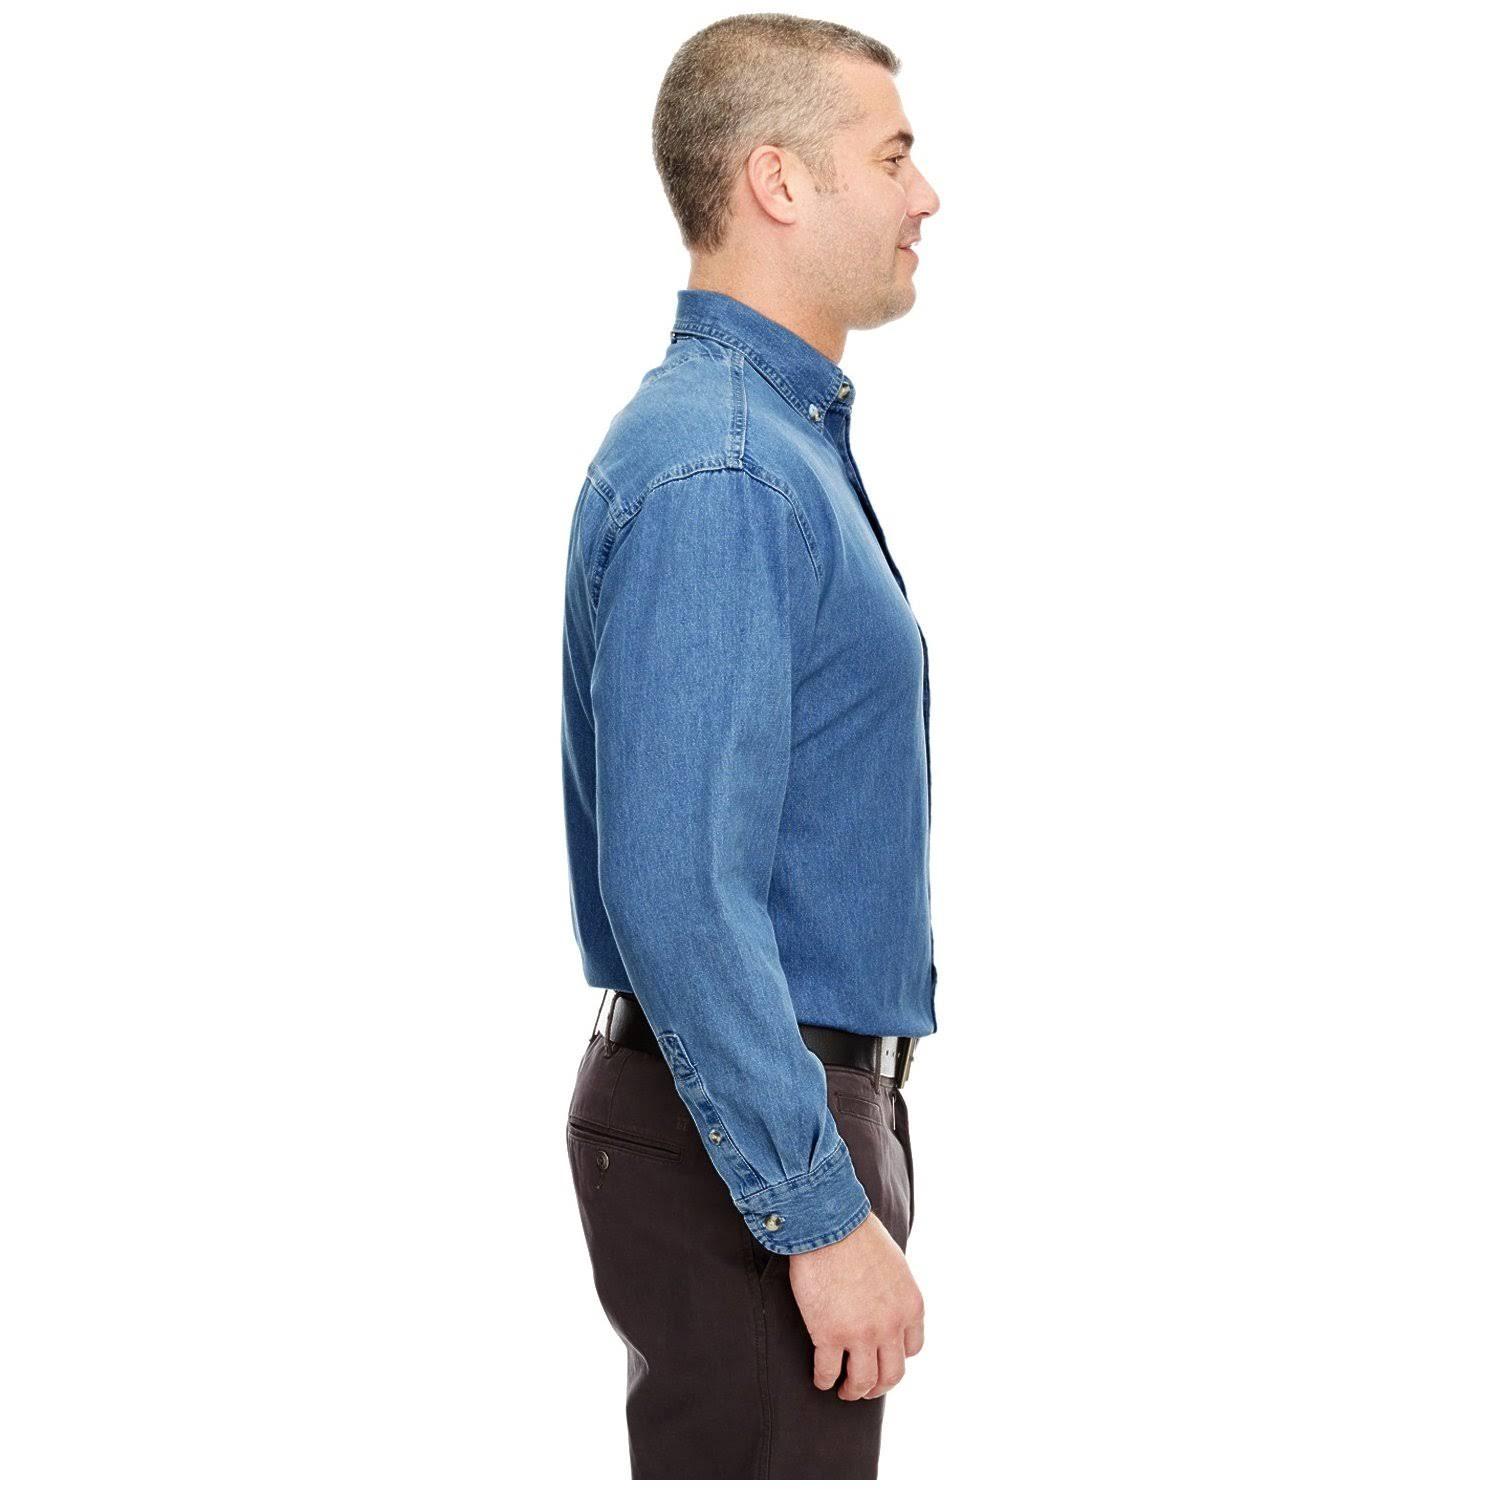 Cypress Herren Pocket large indigo Shirt Denim Ultraclub 8960 x OEqngSO5w